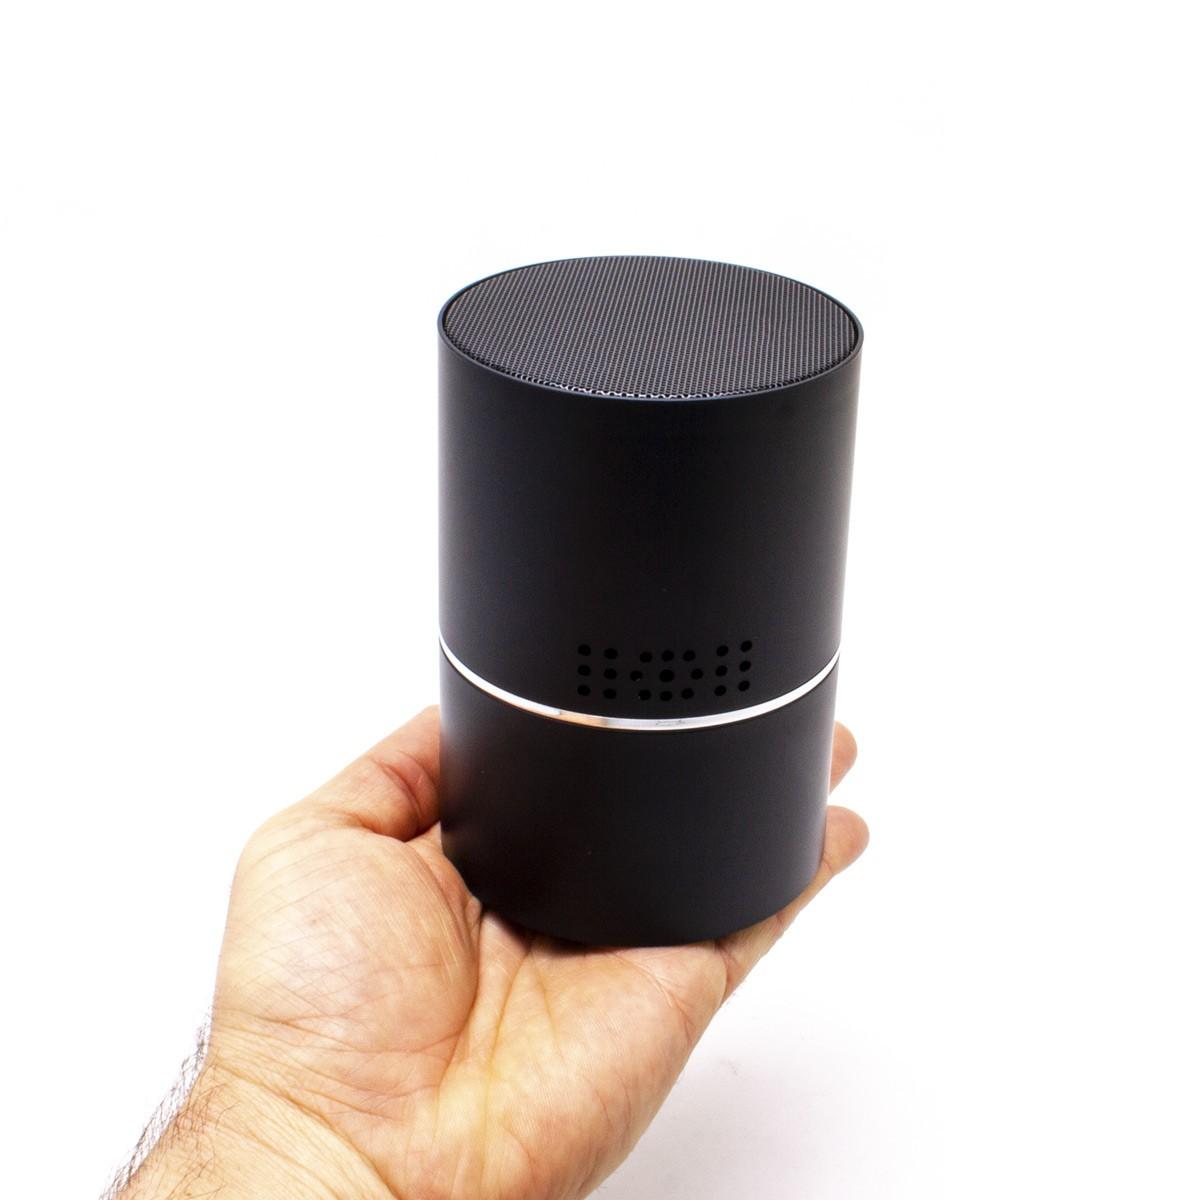 Enceinte bluetooth micro caméra IP WiFi HD pilotable à 330° avec vision nocturne microSD 128 Go incluse